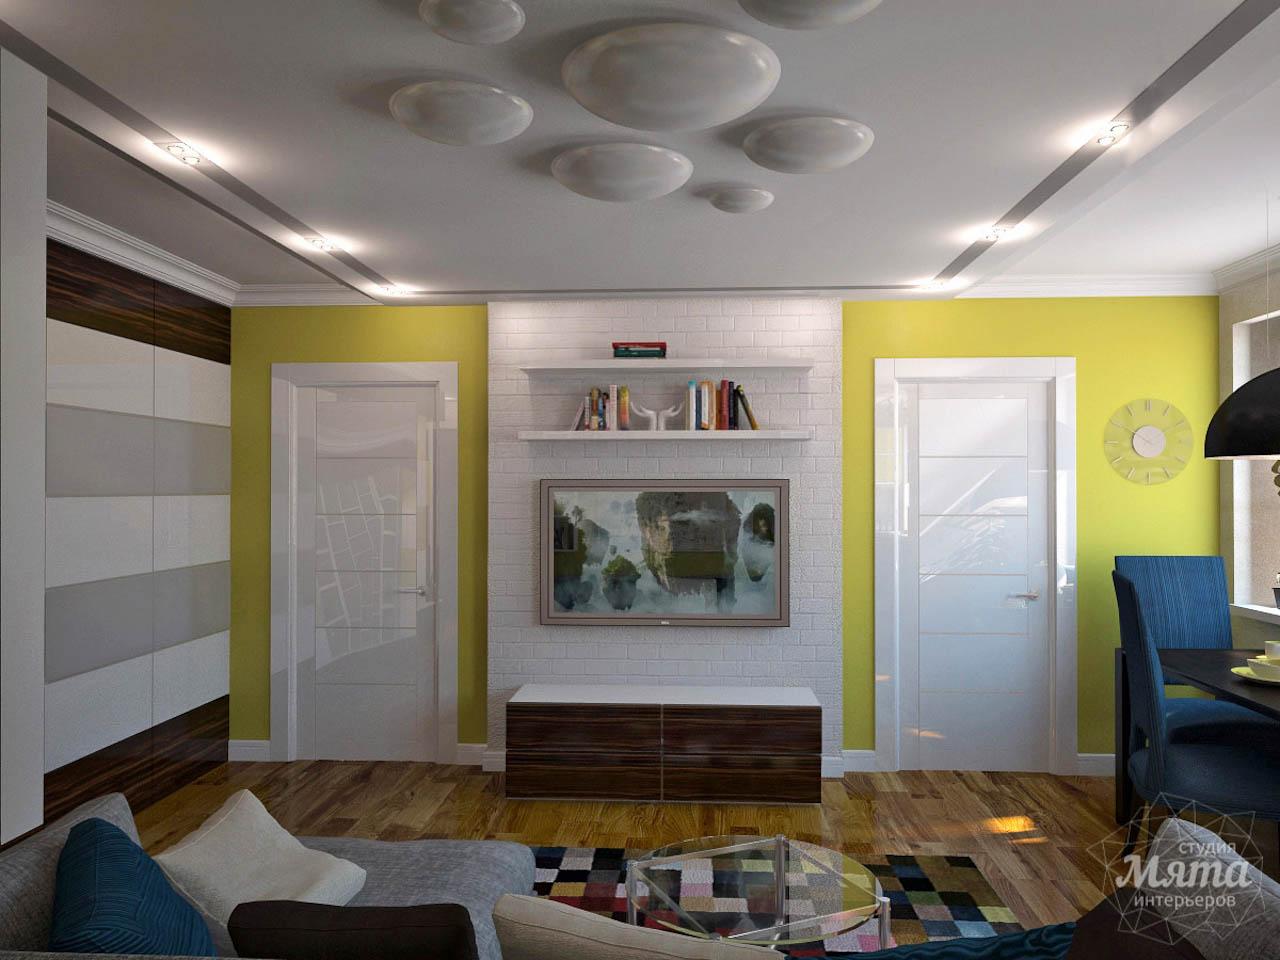 Дизайн интерьера двухкомнатной квартиры по ул. Комсомольская 14 img1250343049